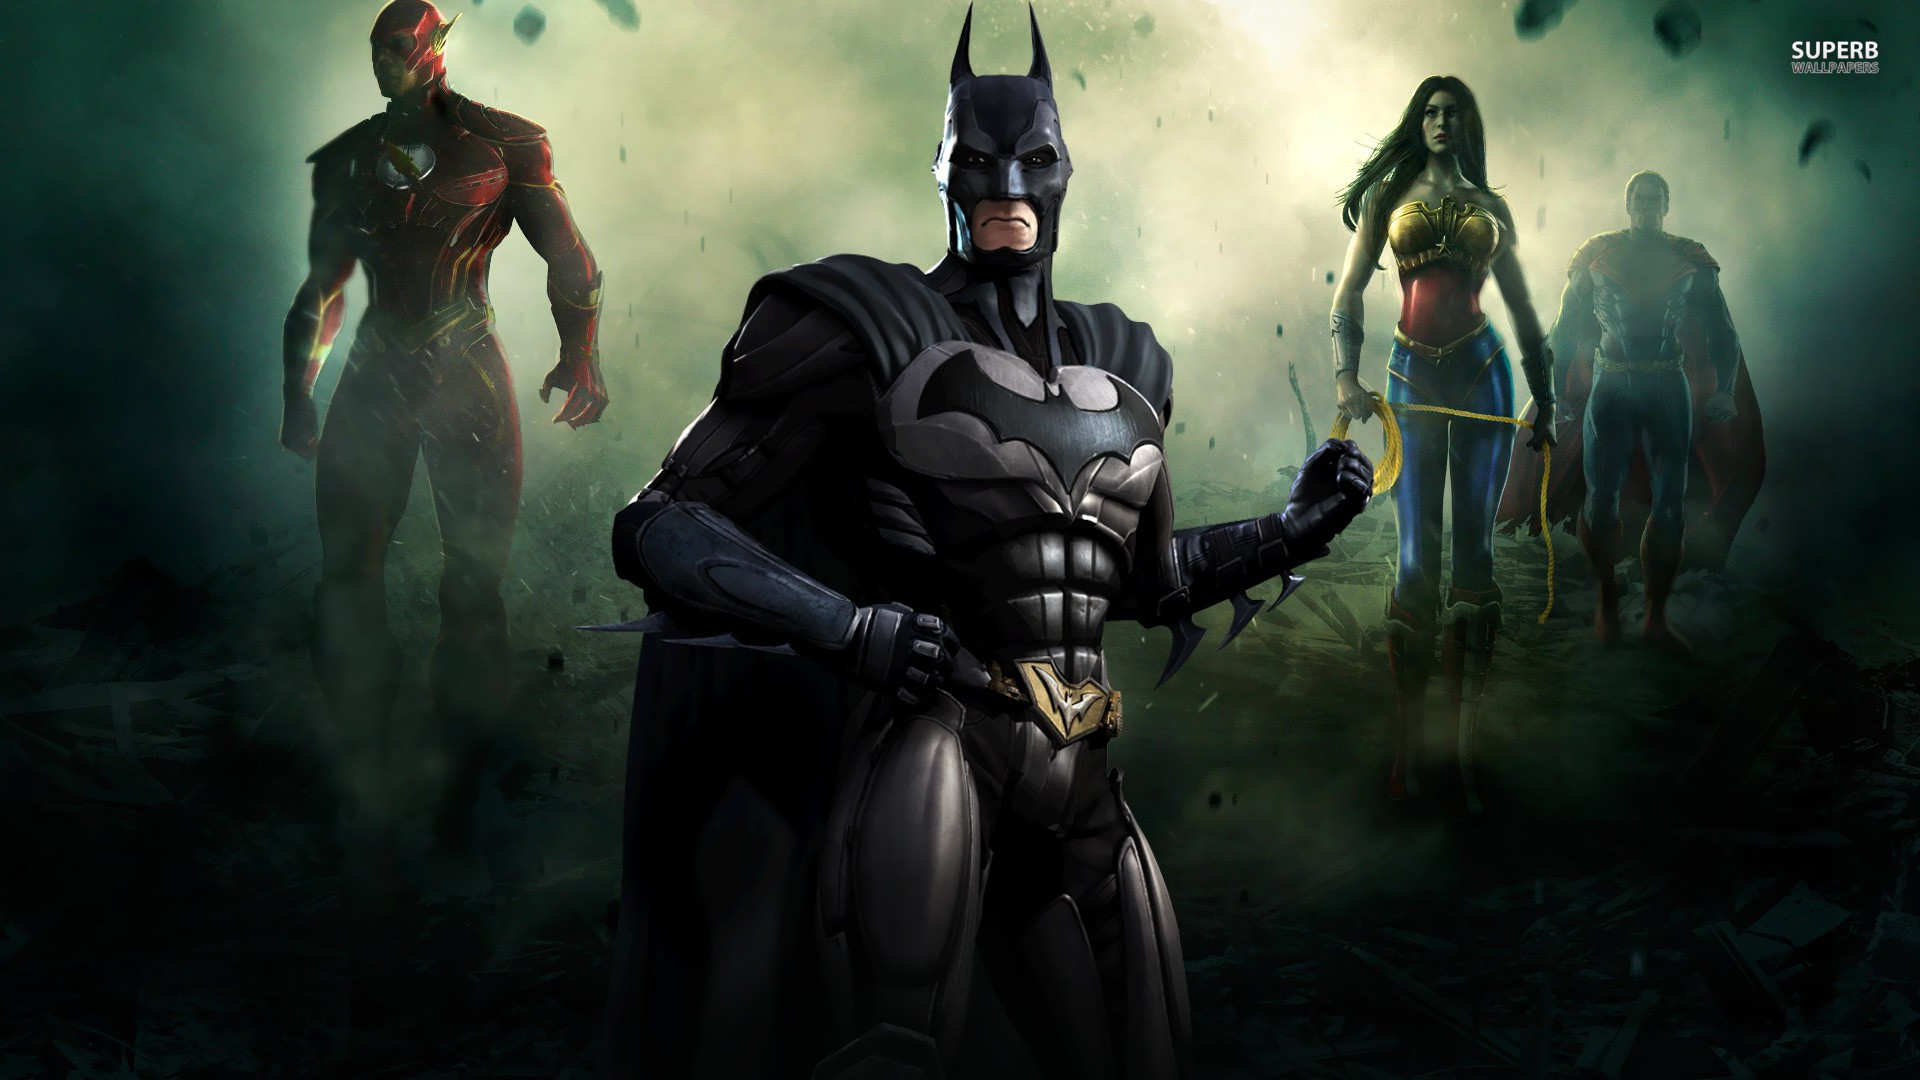 batman video games superman posters gods lightning bolt